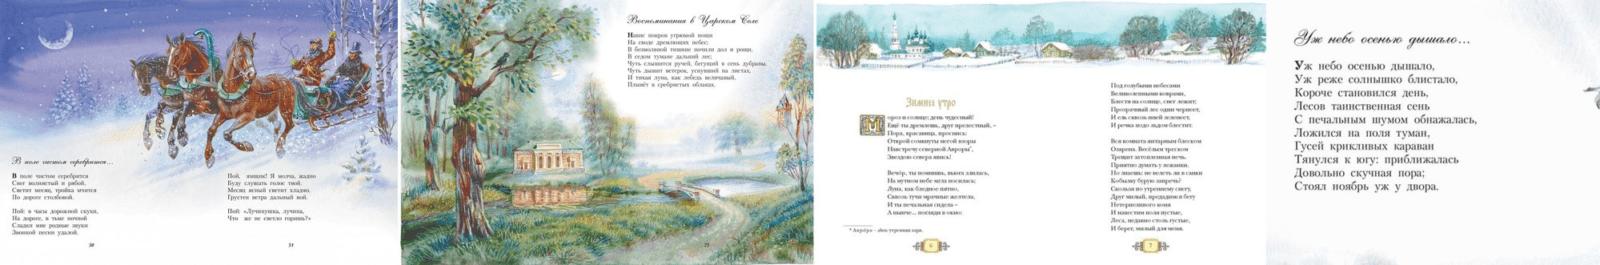 Стихотворения Александра Пушкина читает Павел Беседин